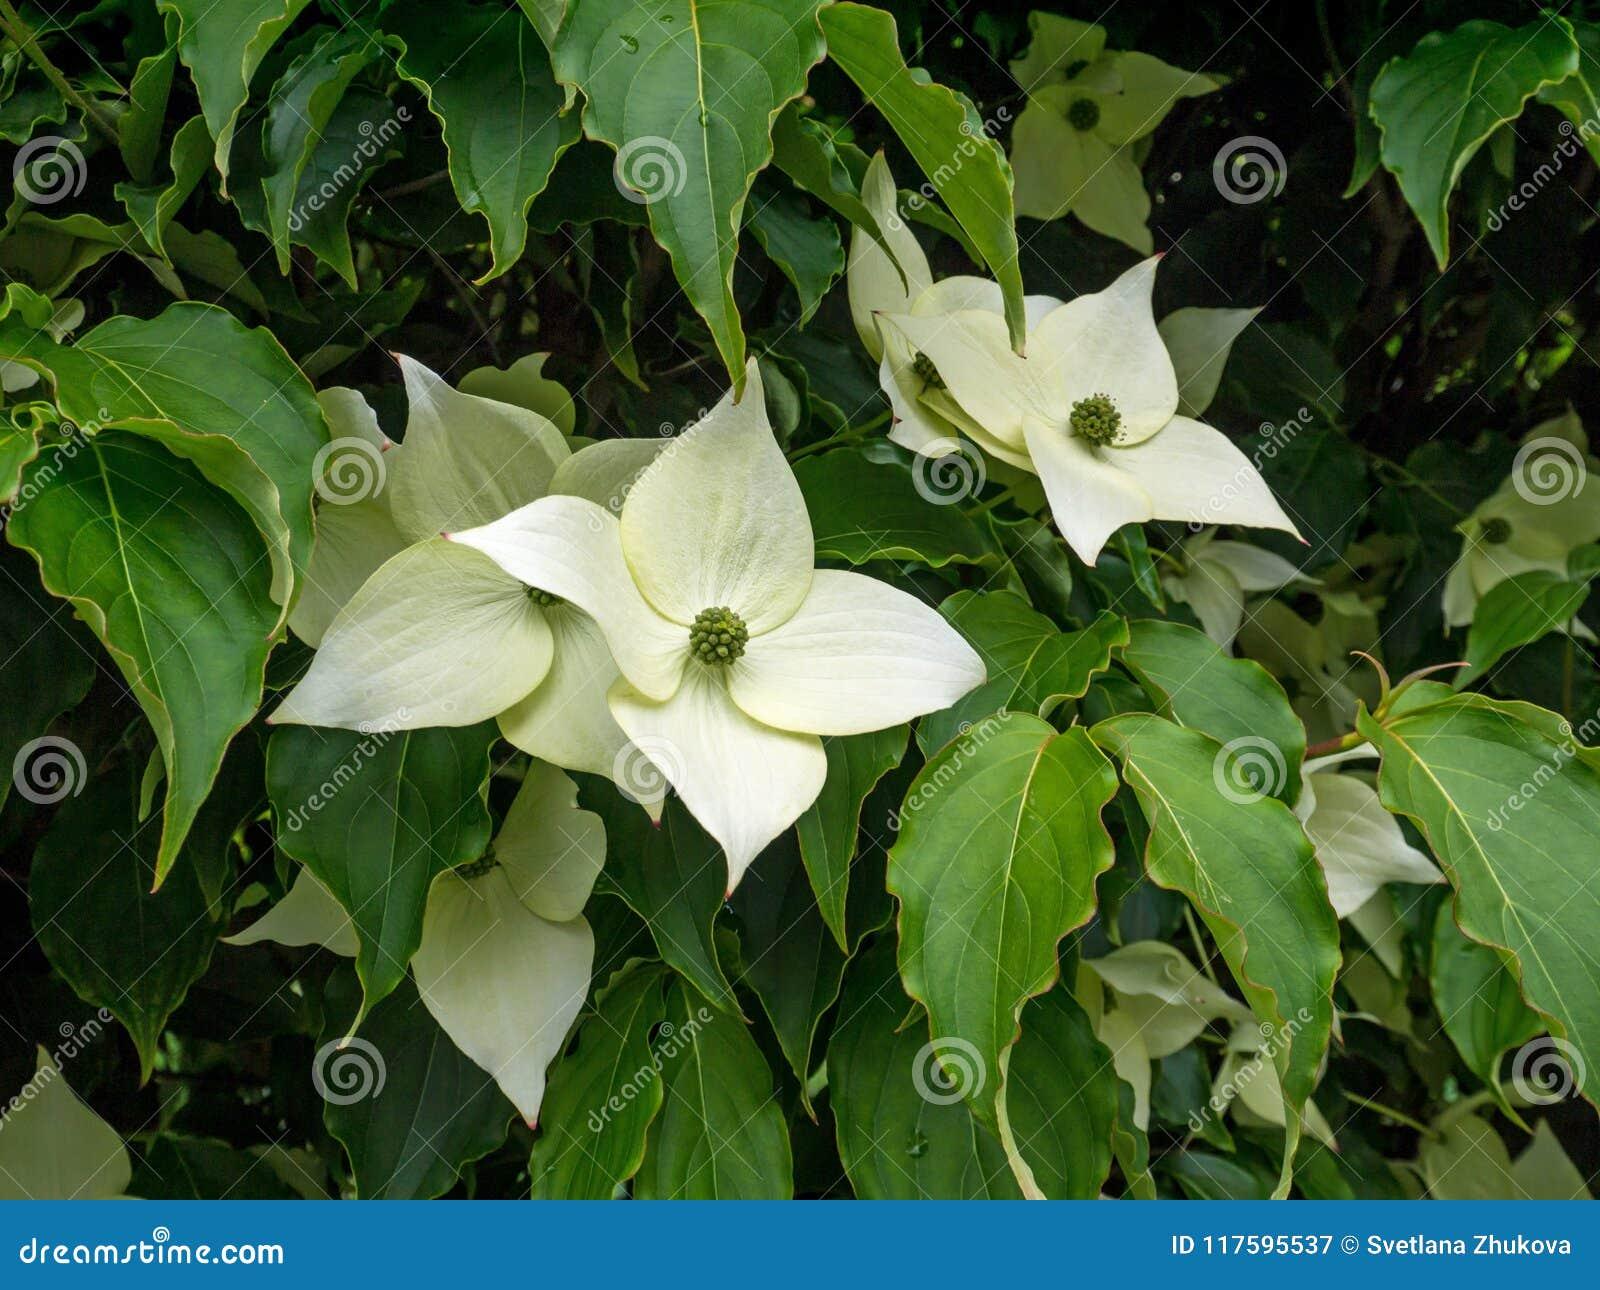 Dogwood Tree White Four Petal Flowers Stock Image Image Of